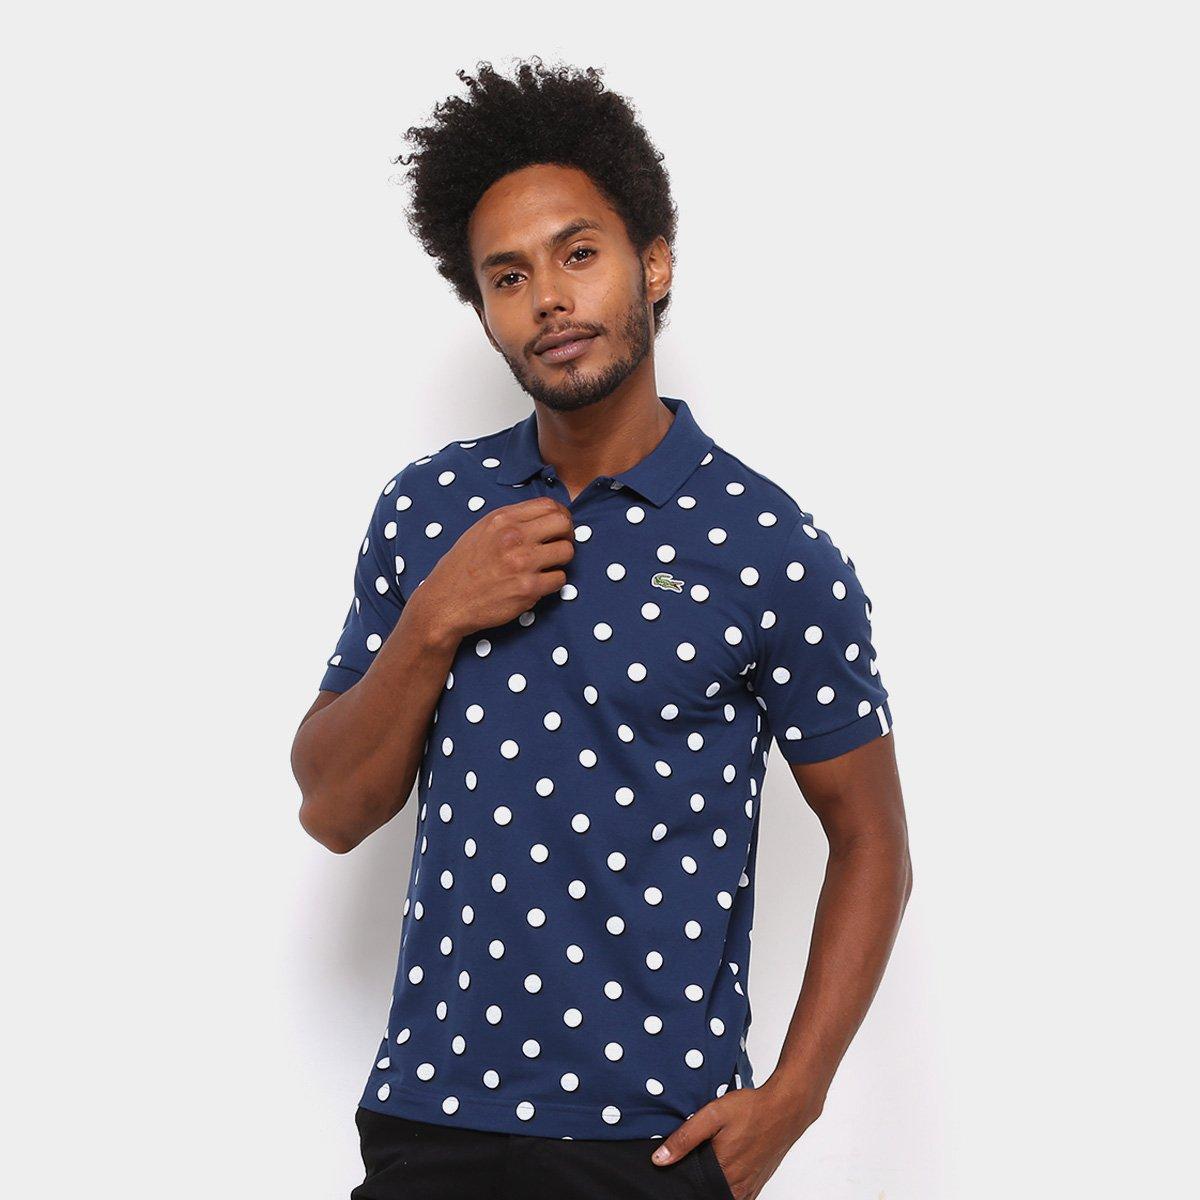 Camisa Polo Lacoste Live Piquet Full Print Masculino - Compre Agora ... 46c61111a7cbd